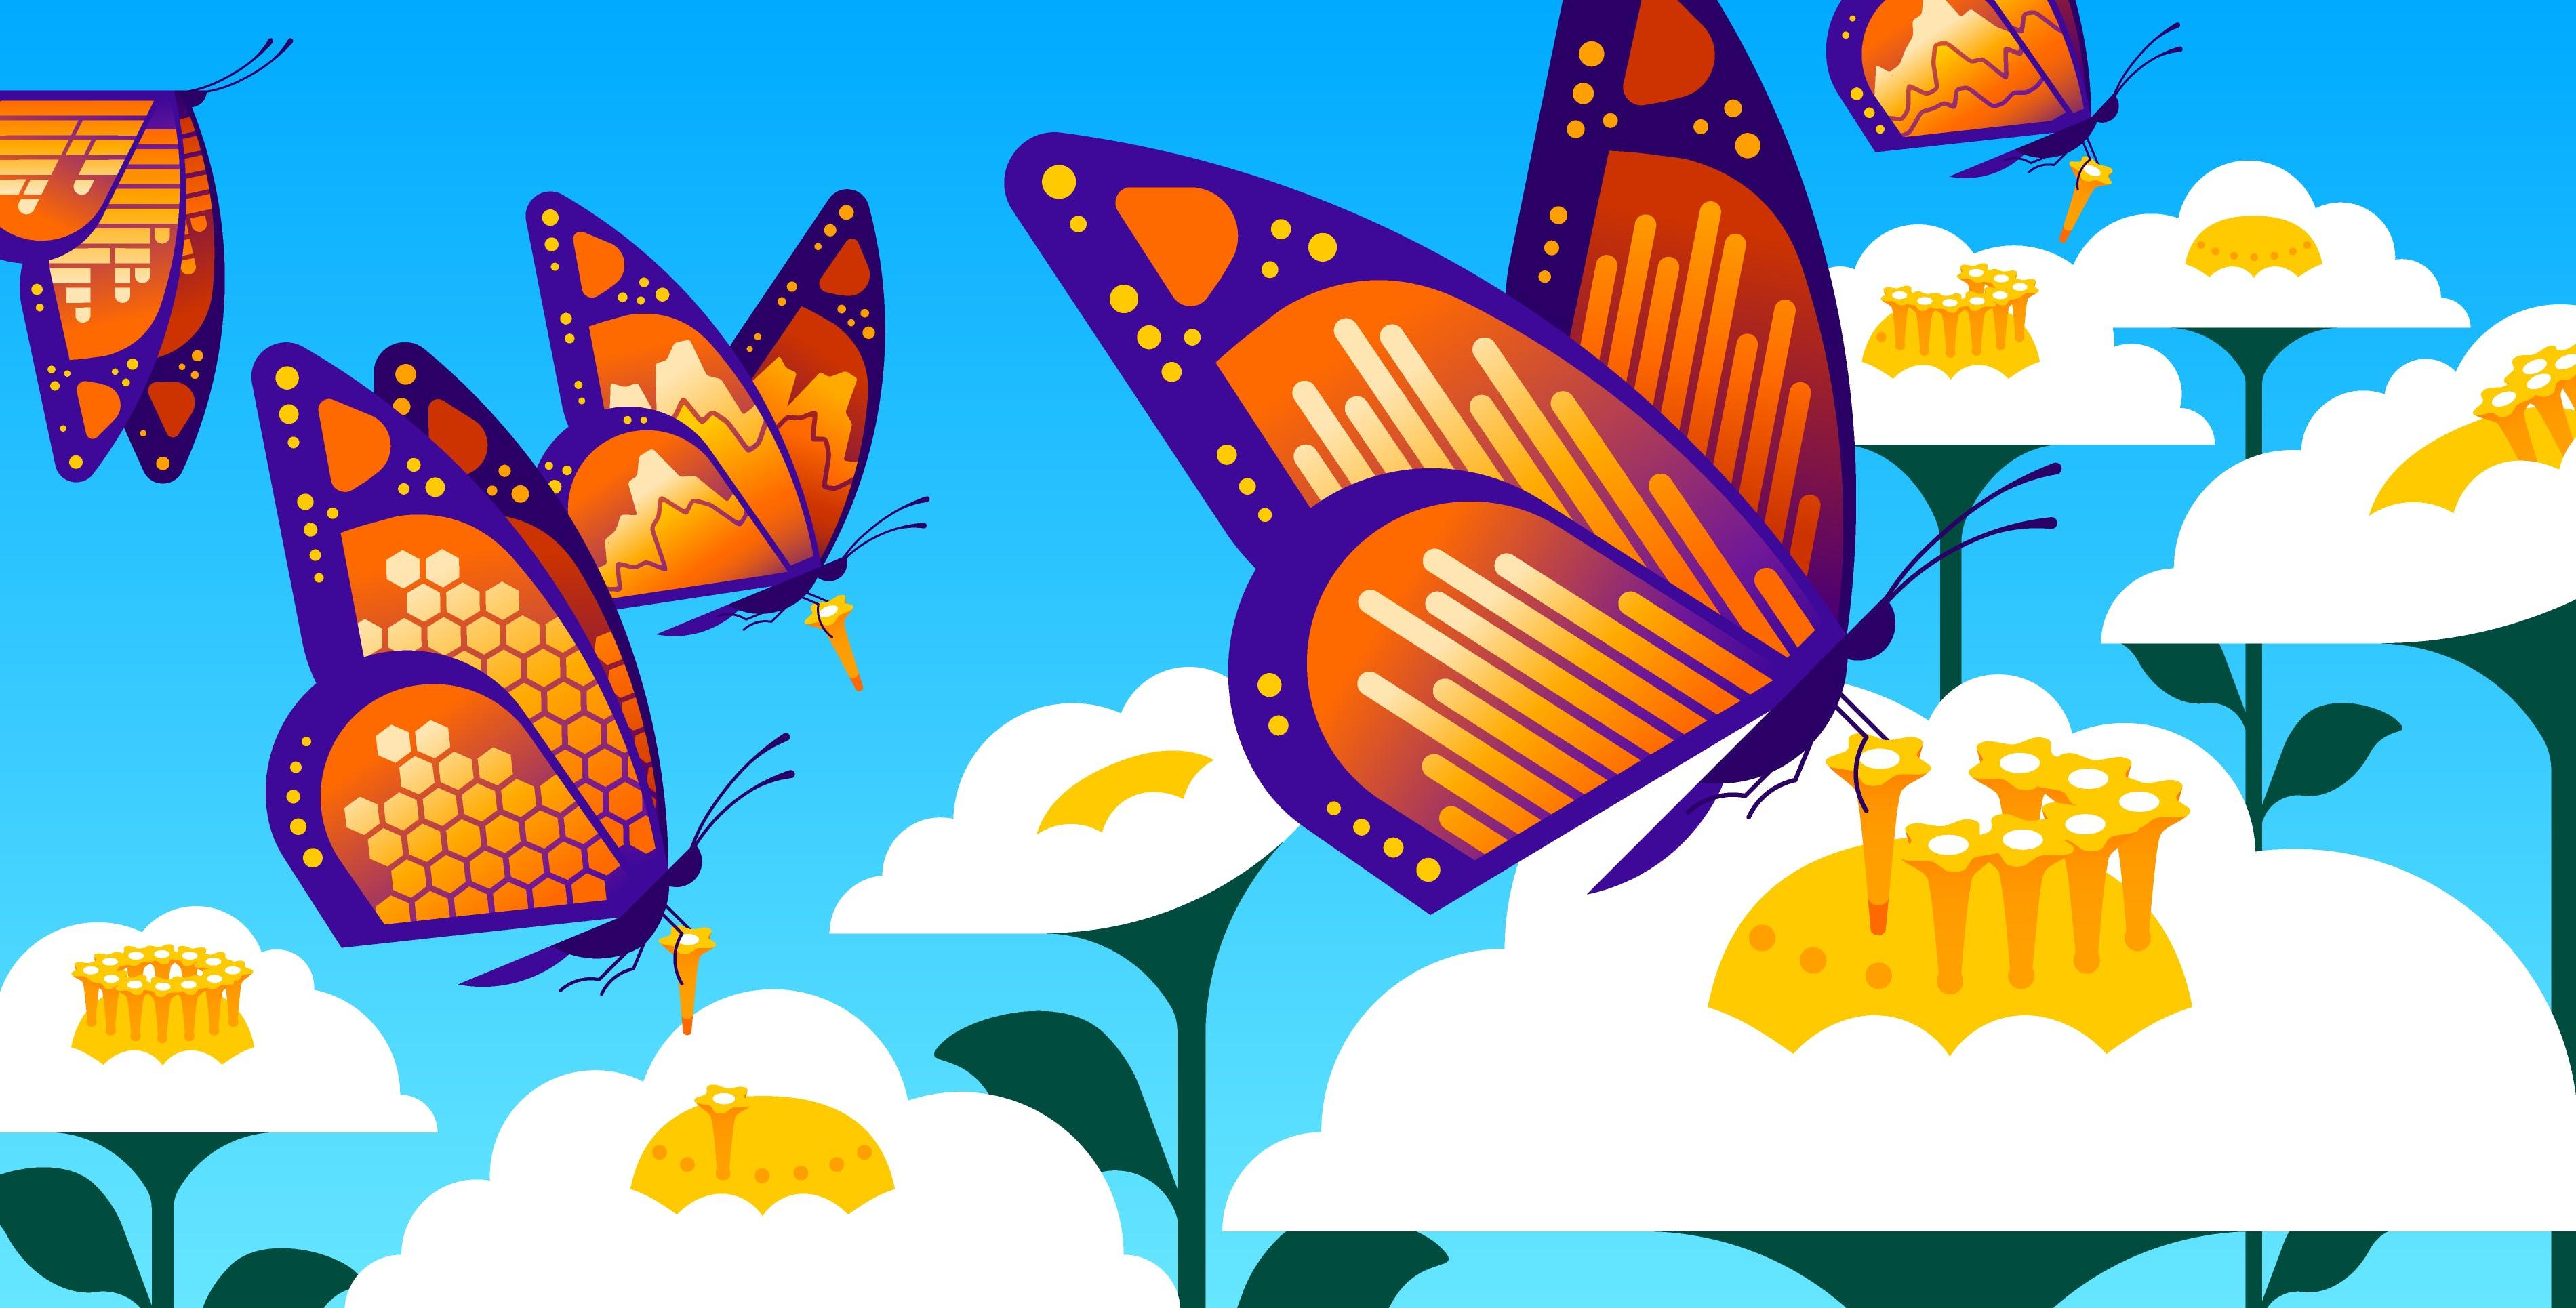 blog/cloud-migration-monitoring/migration_monitoring_210628_FINAL.png